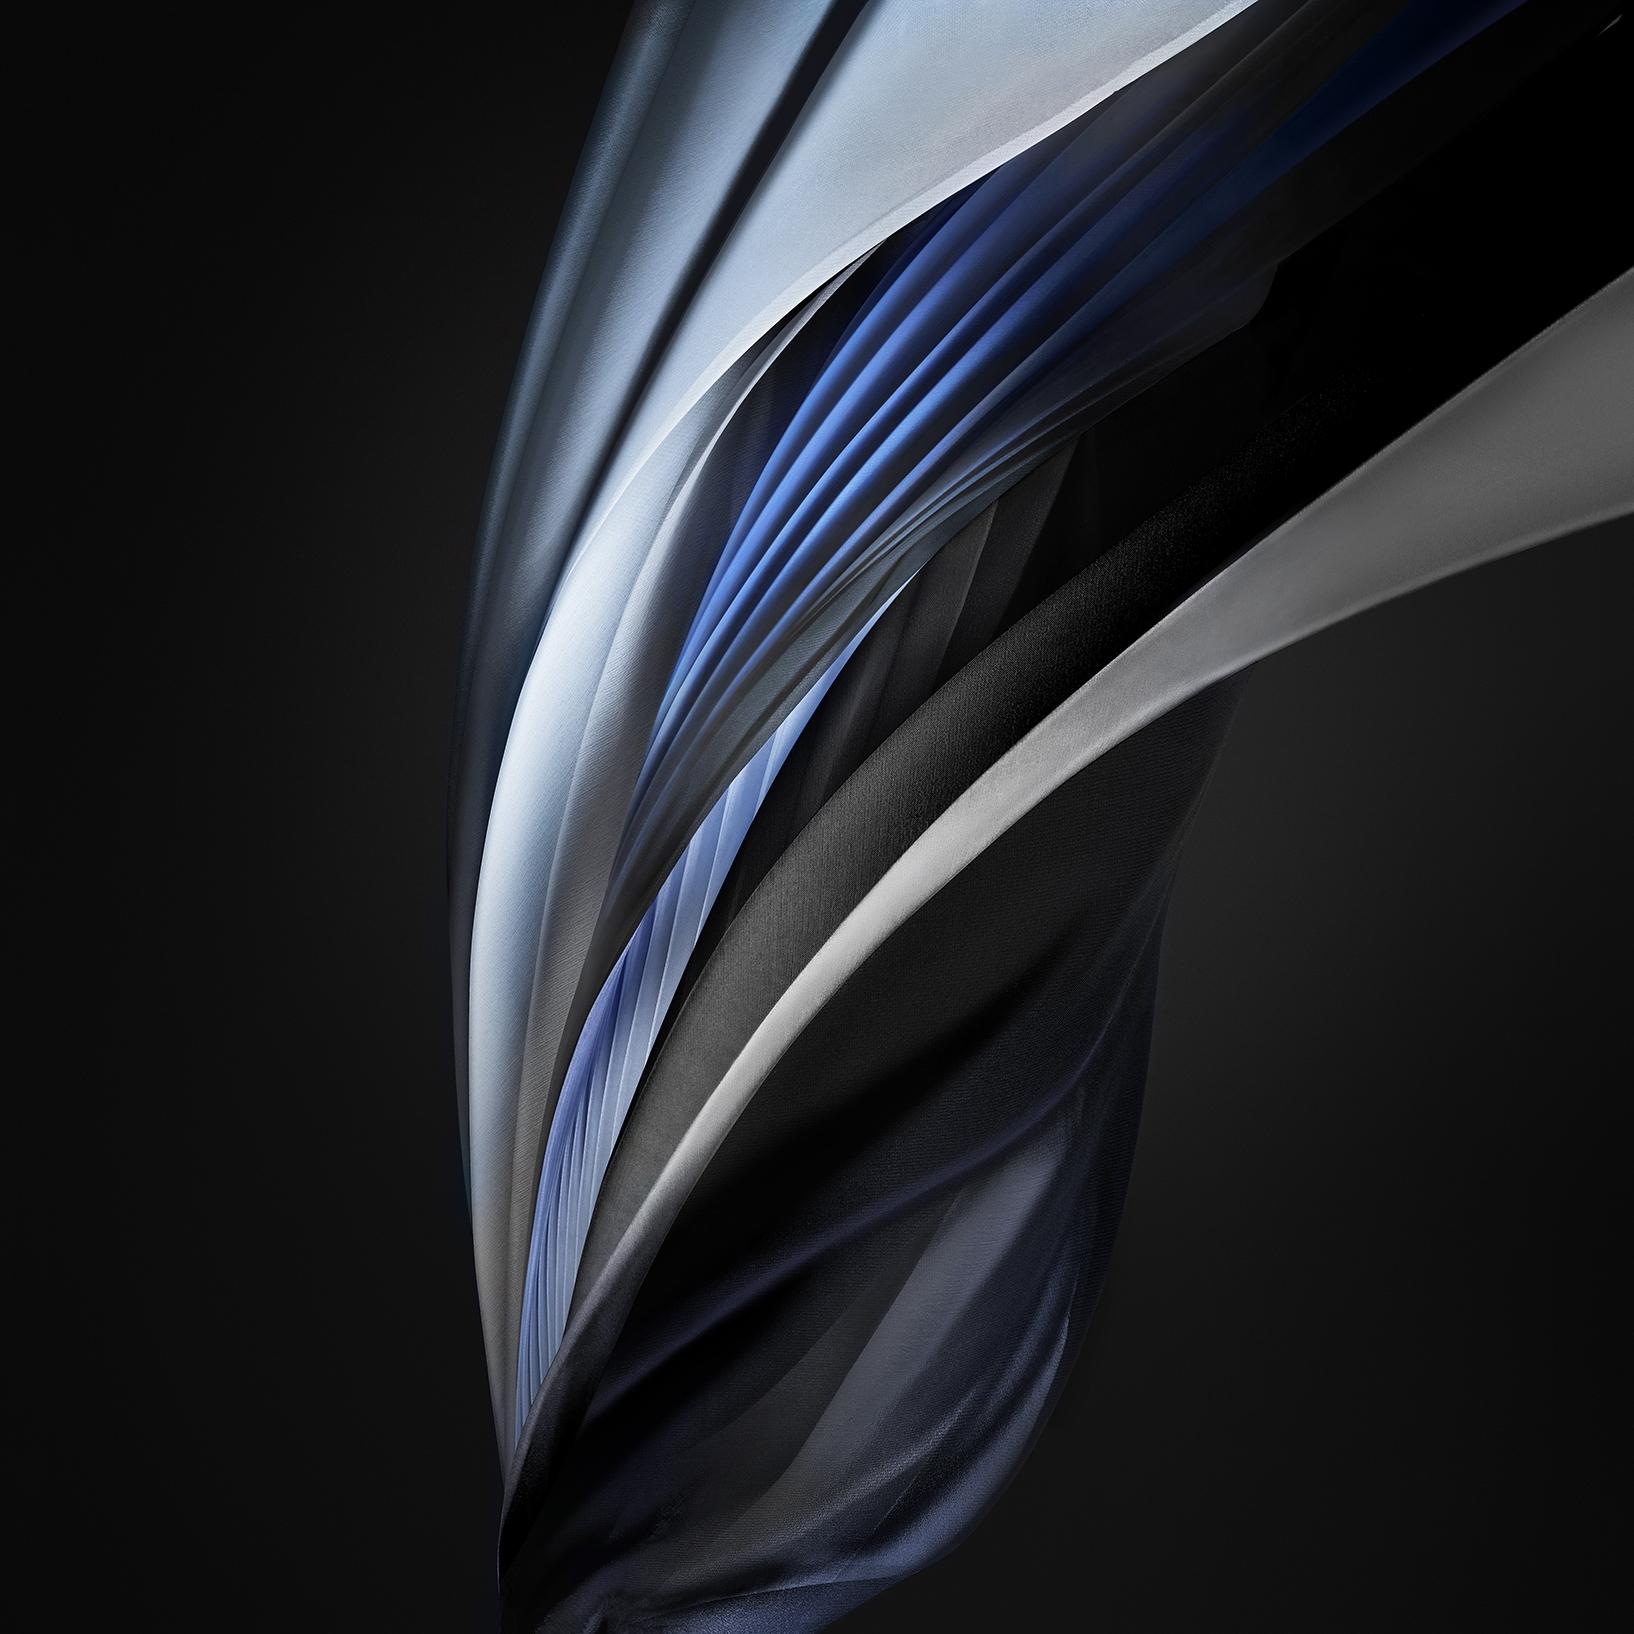 Silk_Silver_Mono_Light- iPhone SE 2020 - TechFoogle